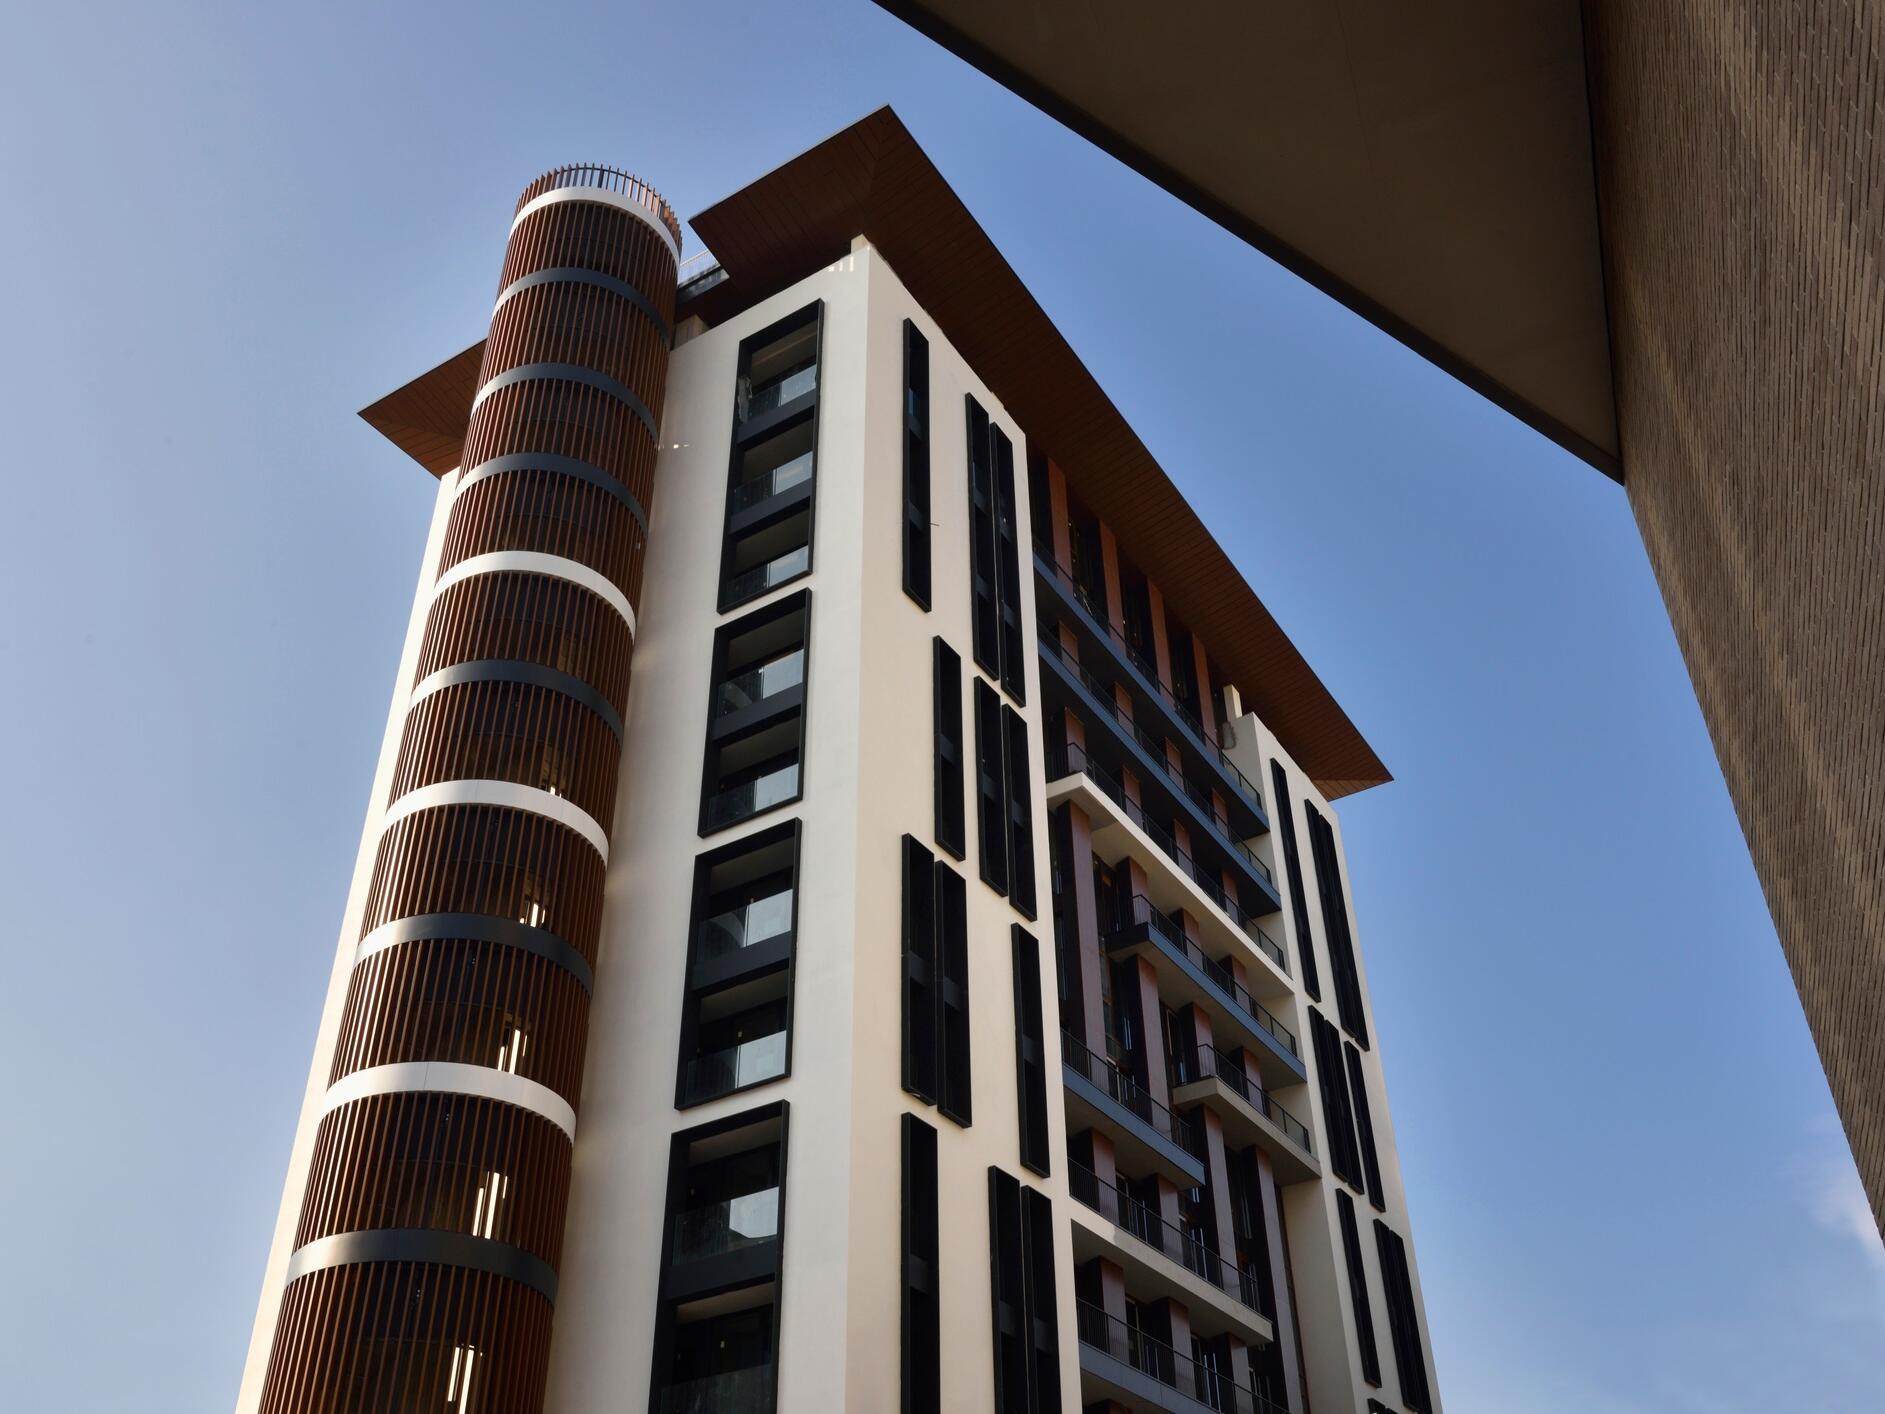 Milano Verticale Hotel Porta Nuova Facade